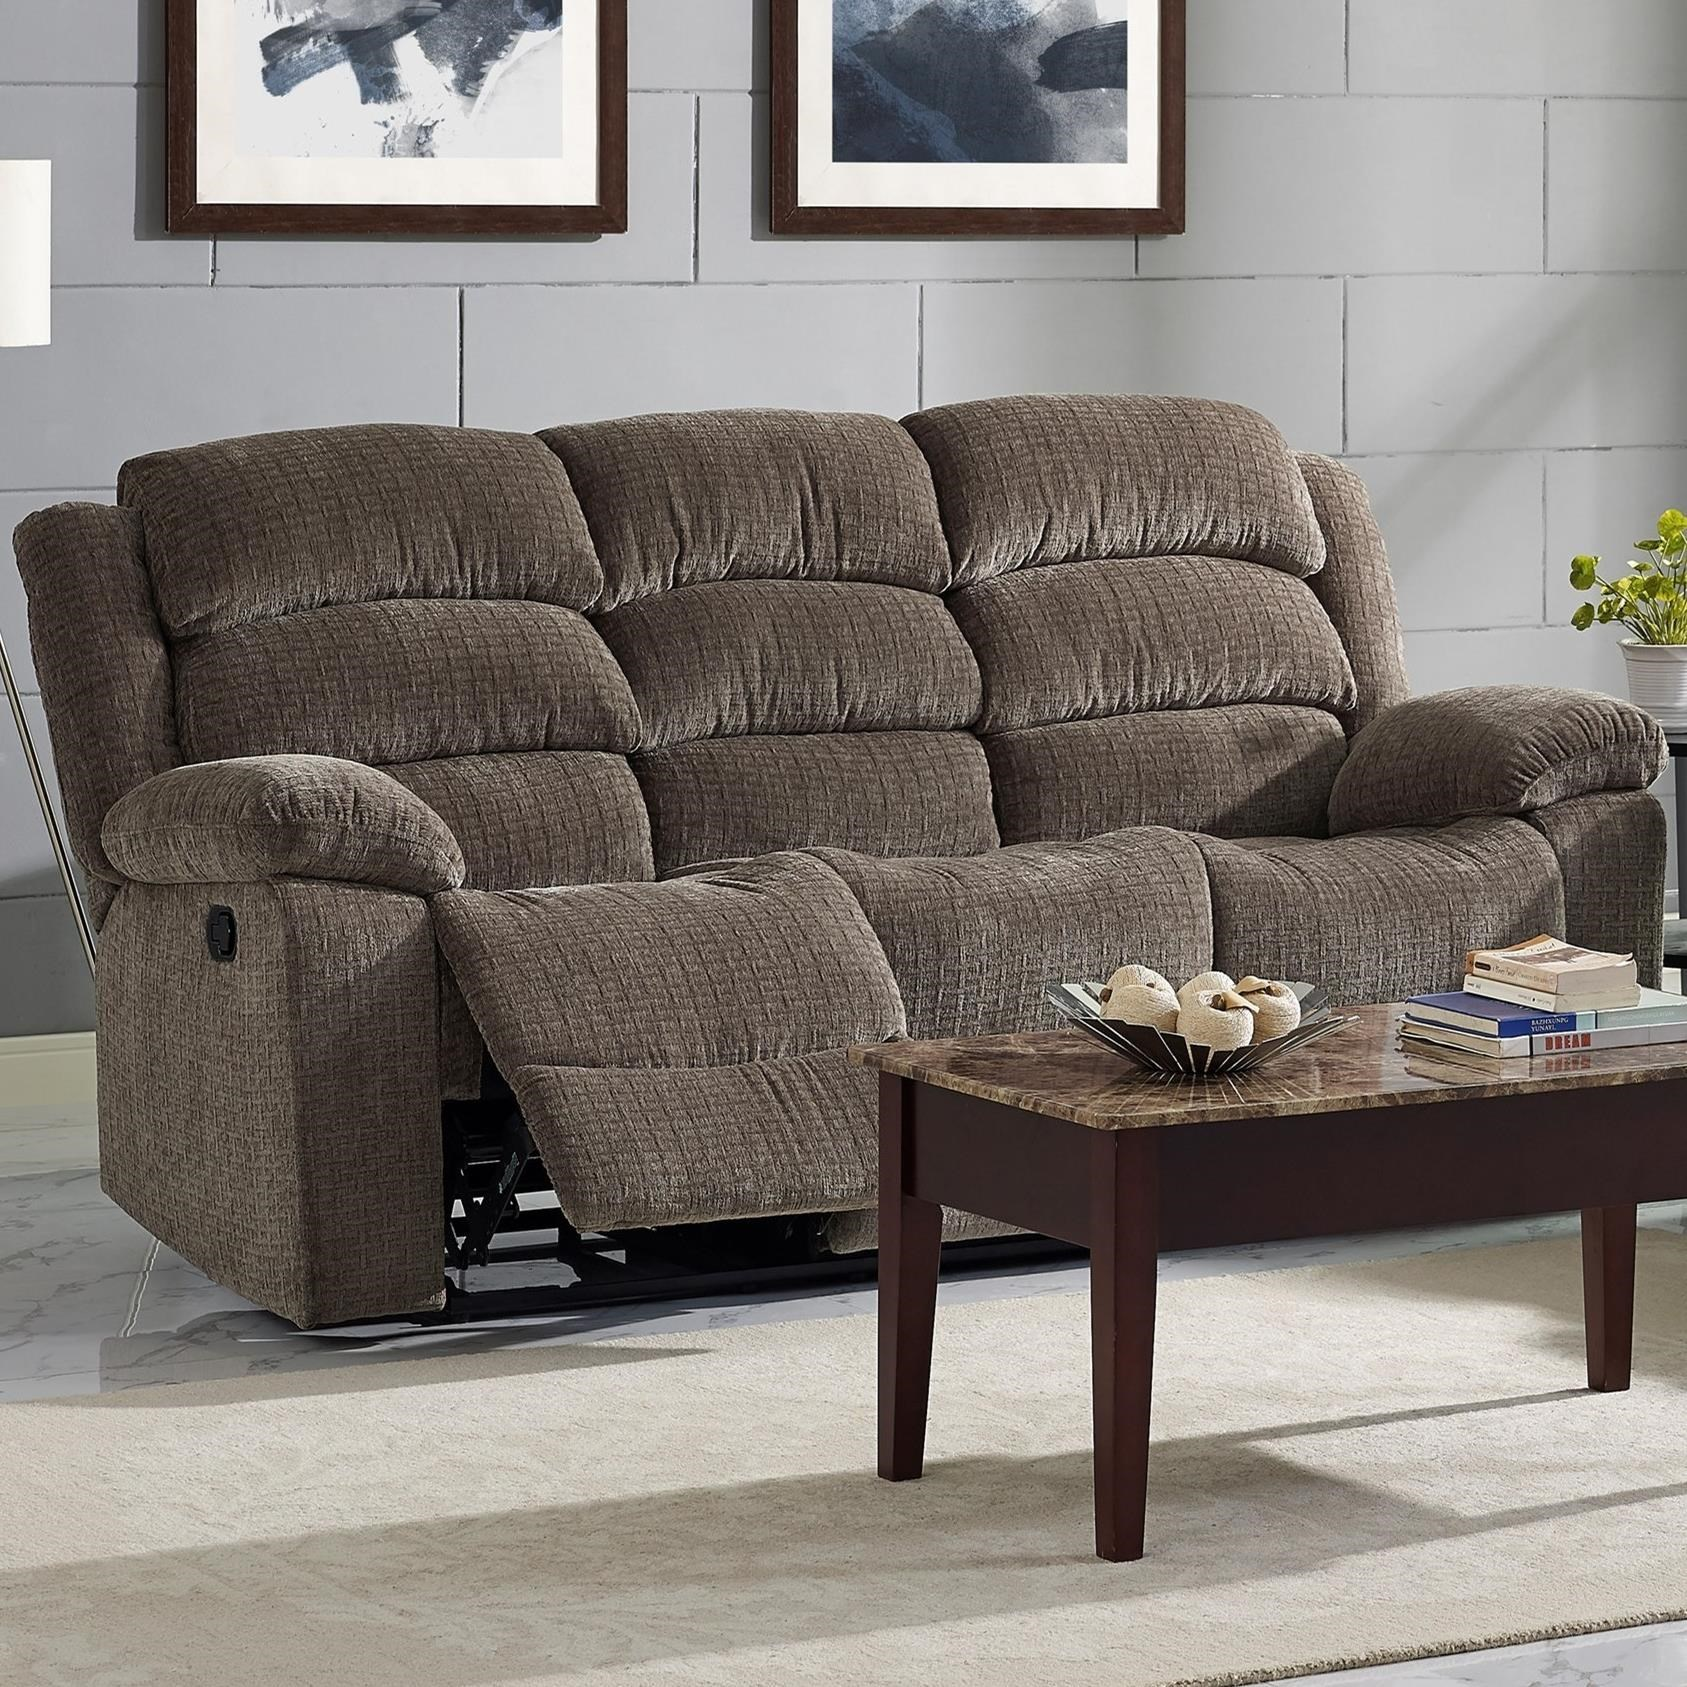 Attirant New Classic AustinReclining Sofa